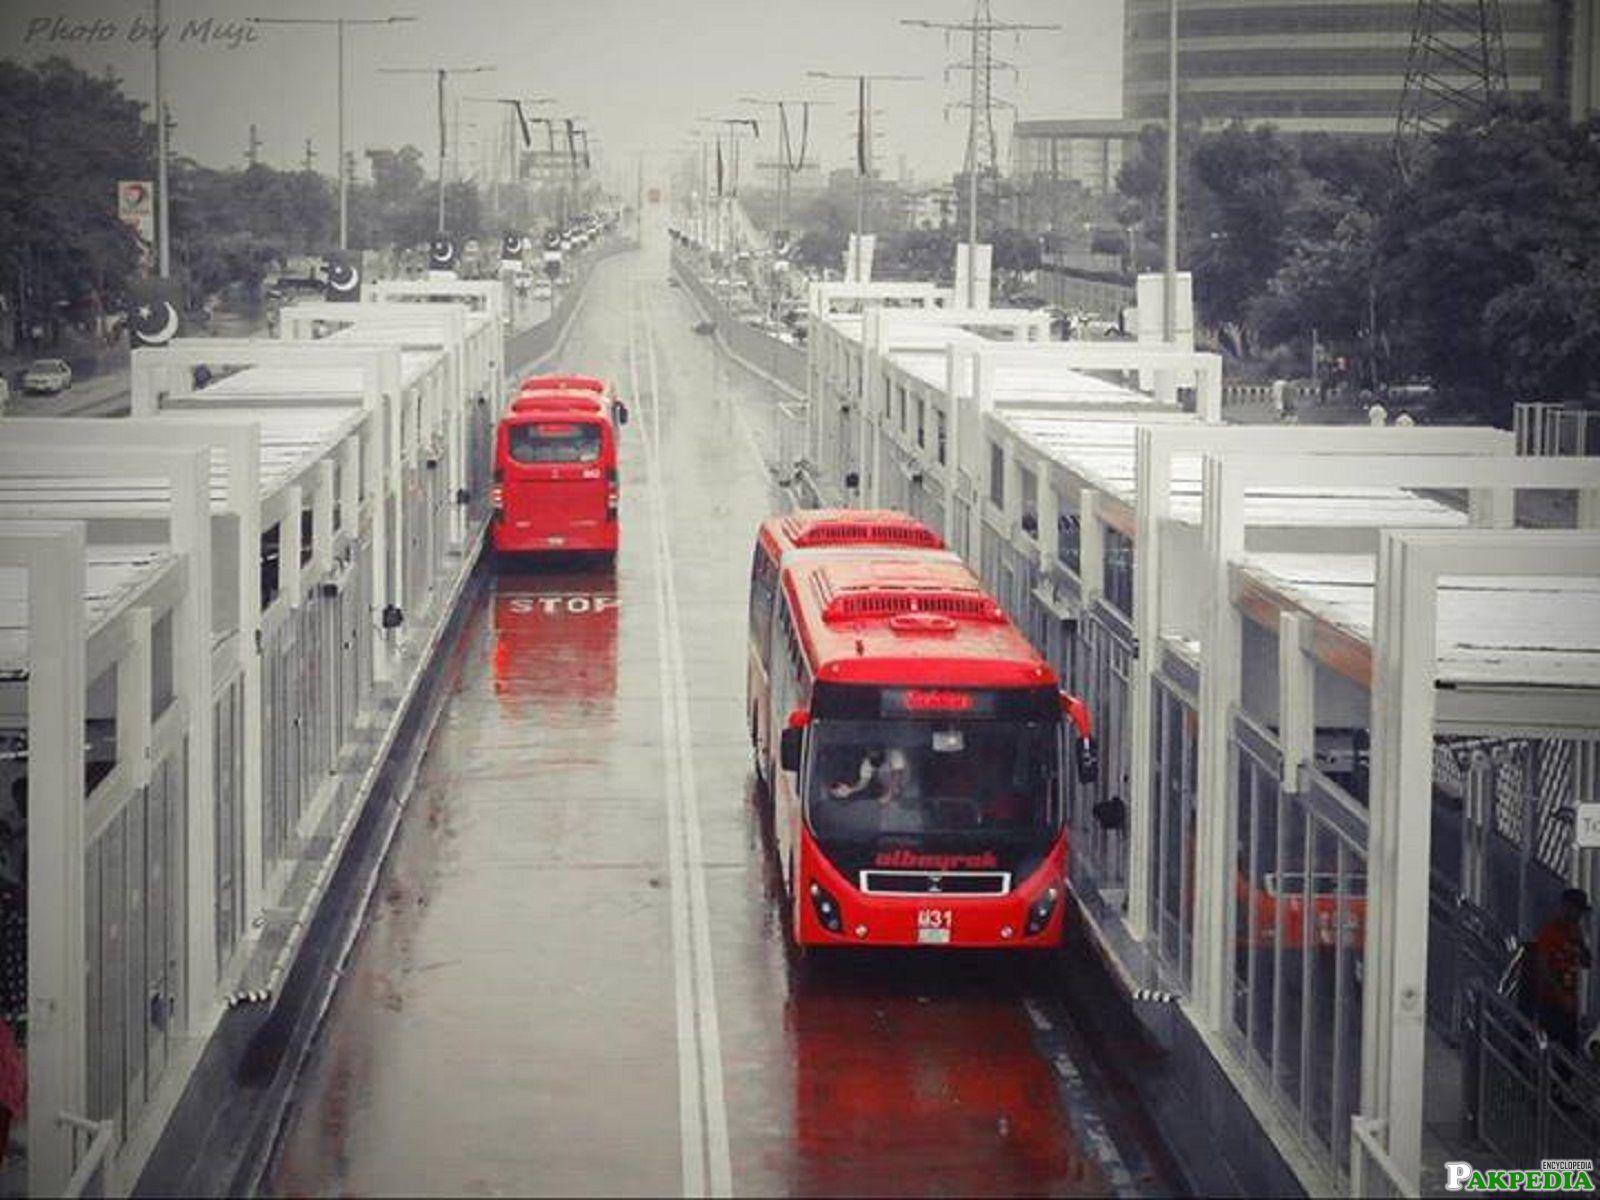 Lahore Transport